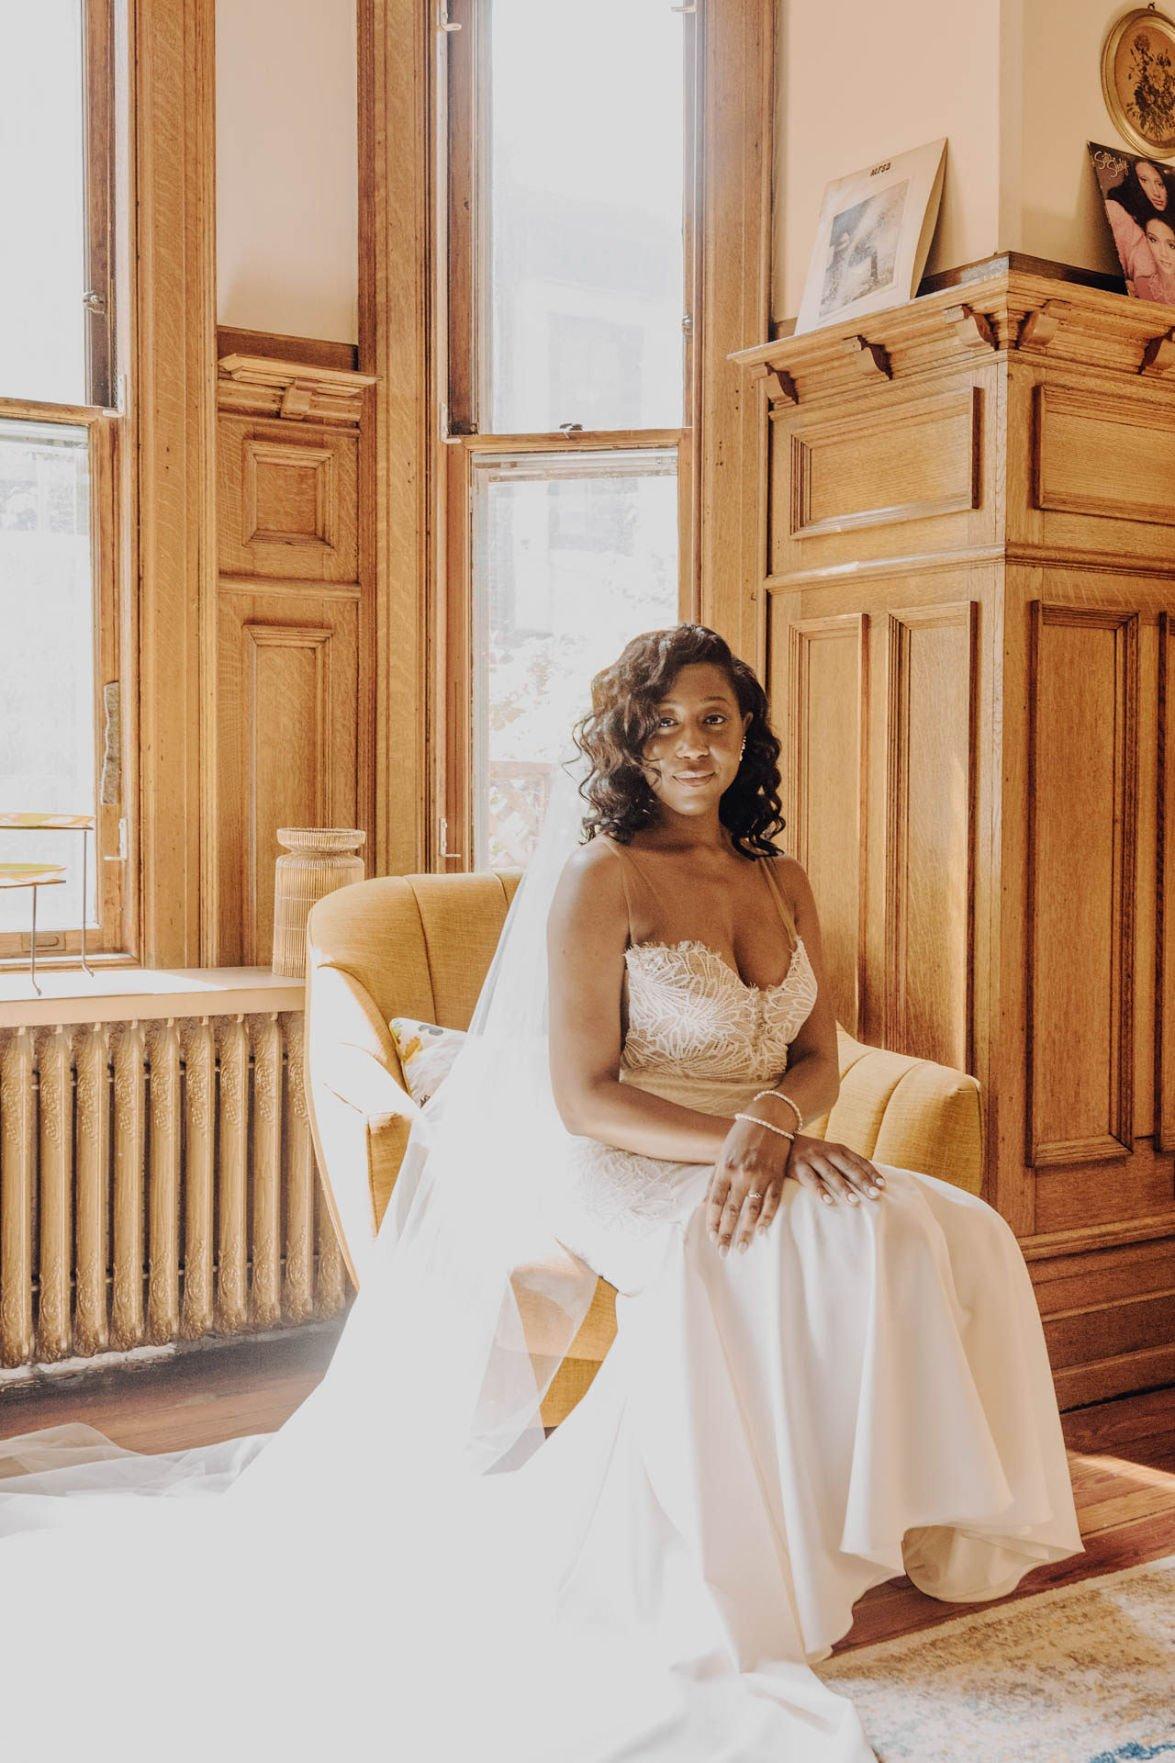 lif-wedding072521-01.jpeg